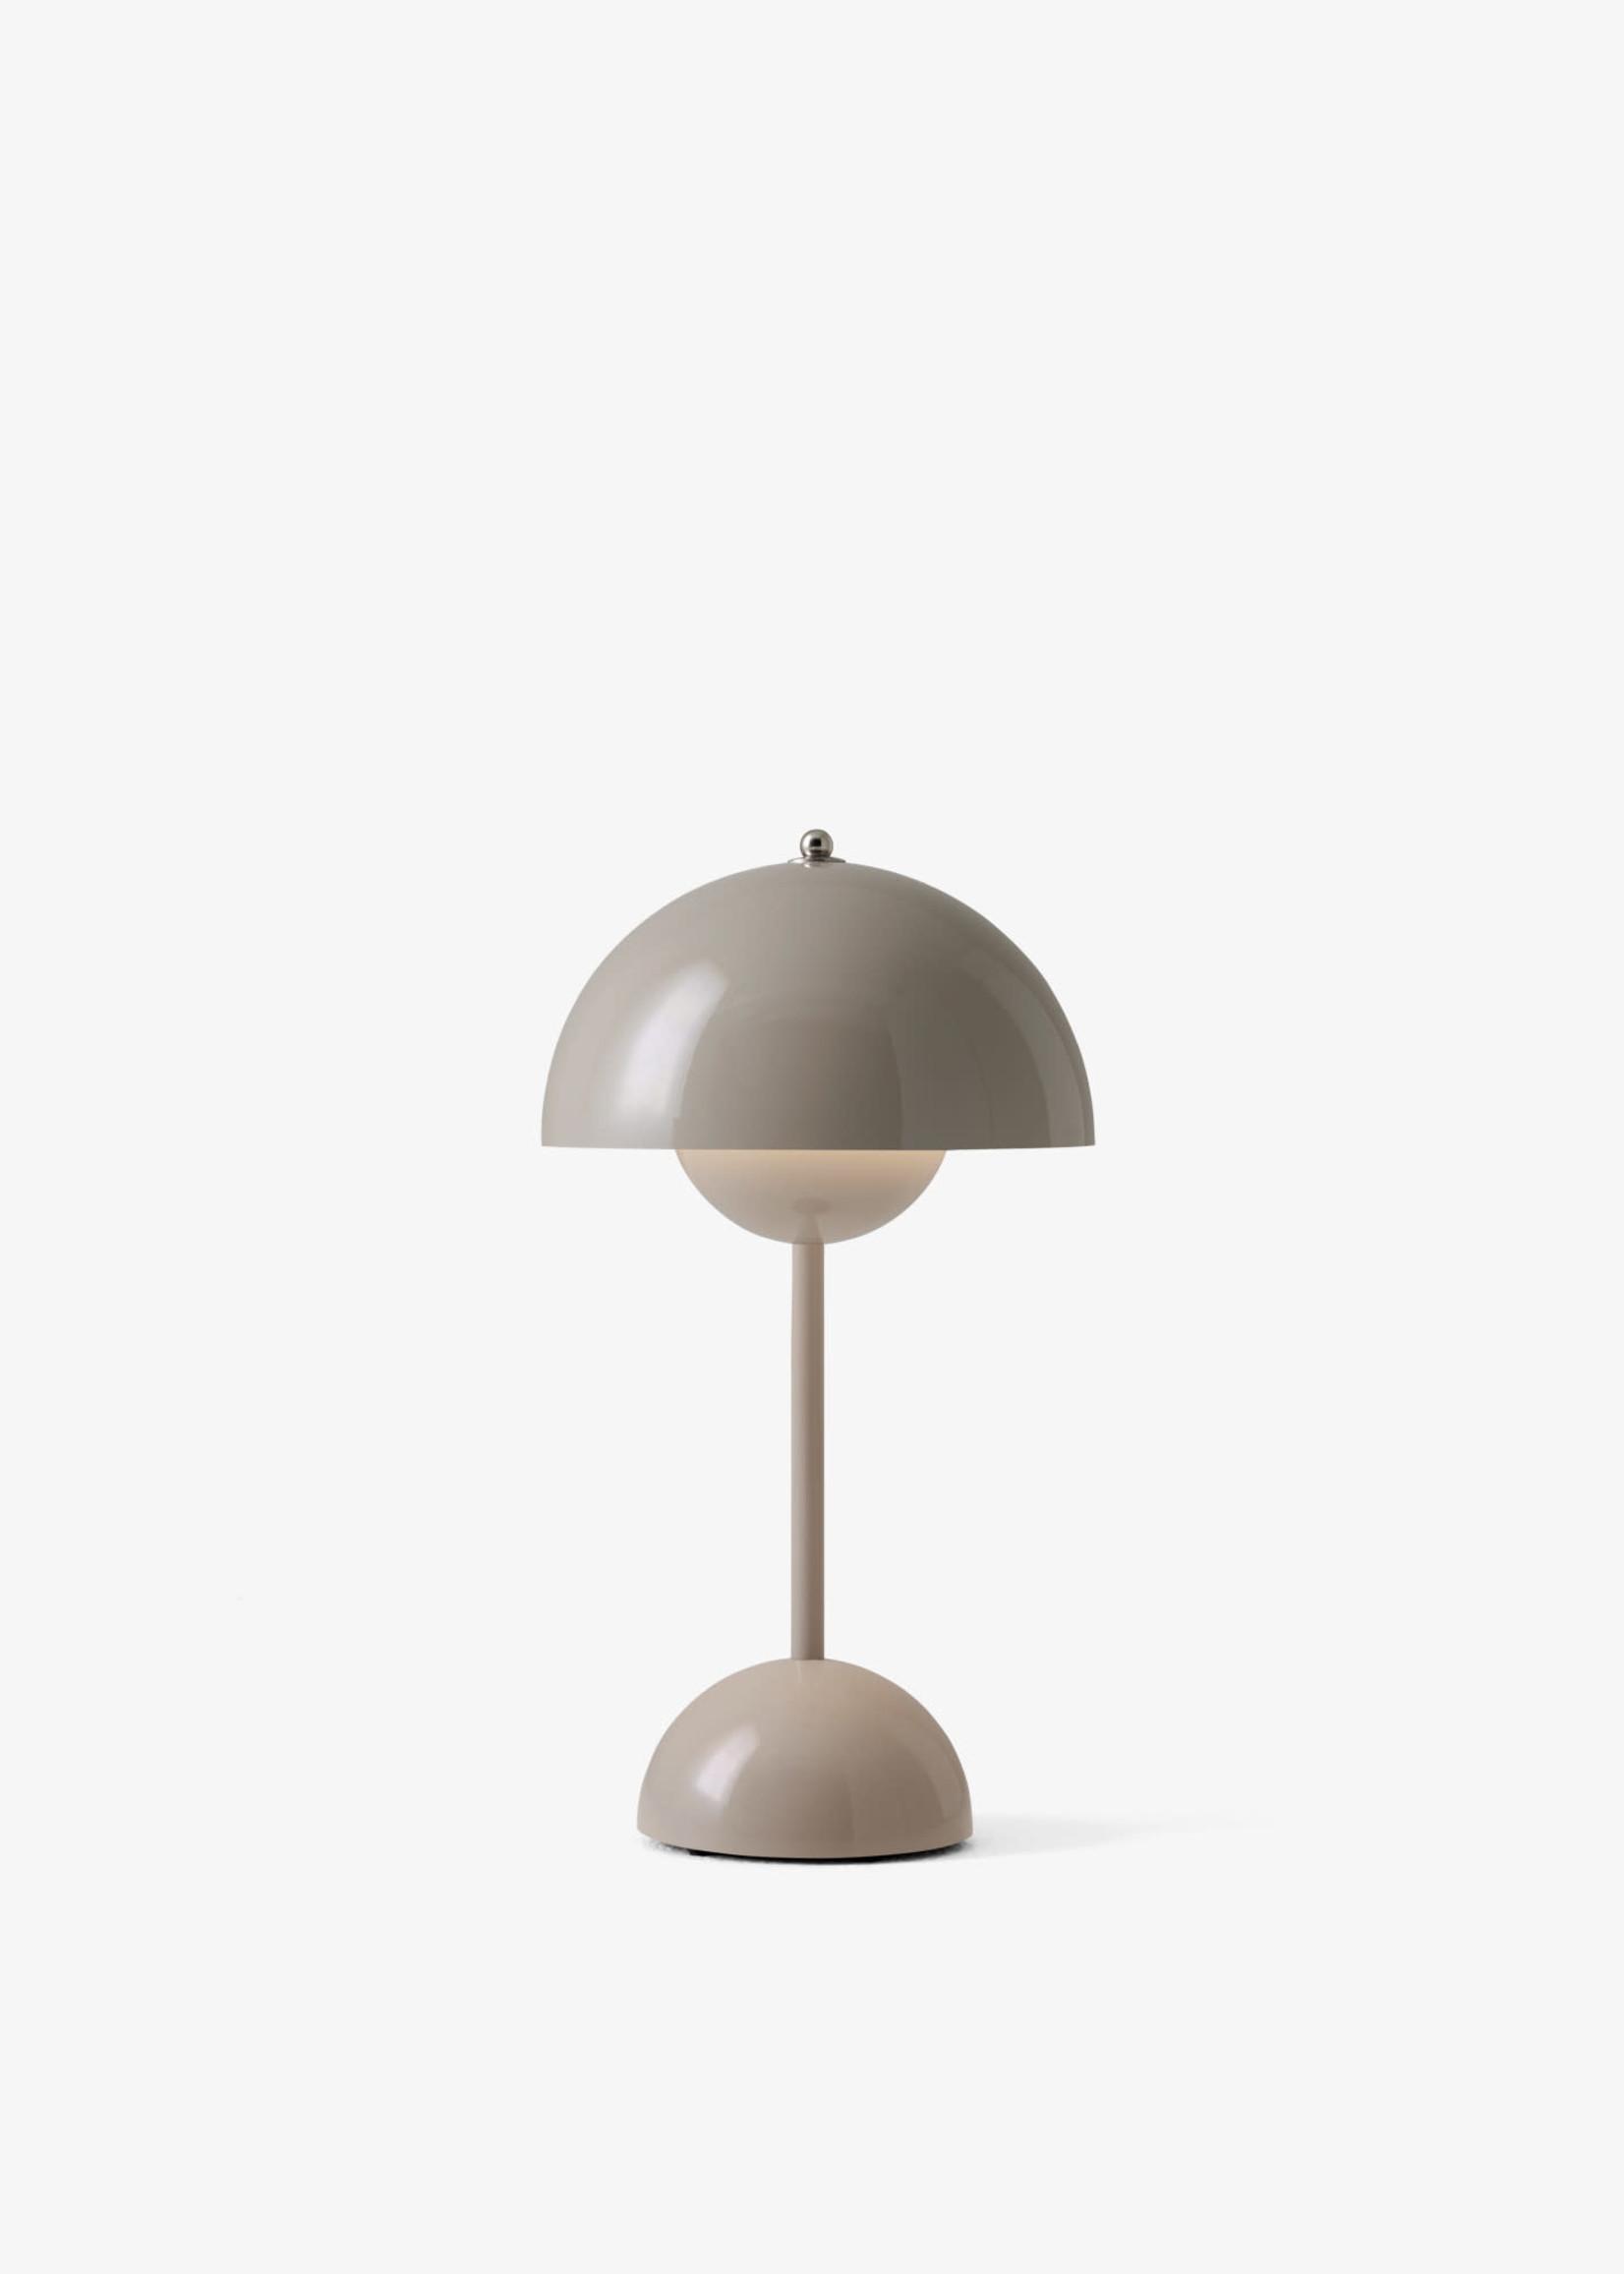 & Tradition Verner Panton Flower Pot Mini Lamp in Grey Beige